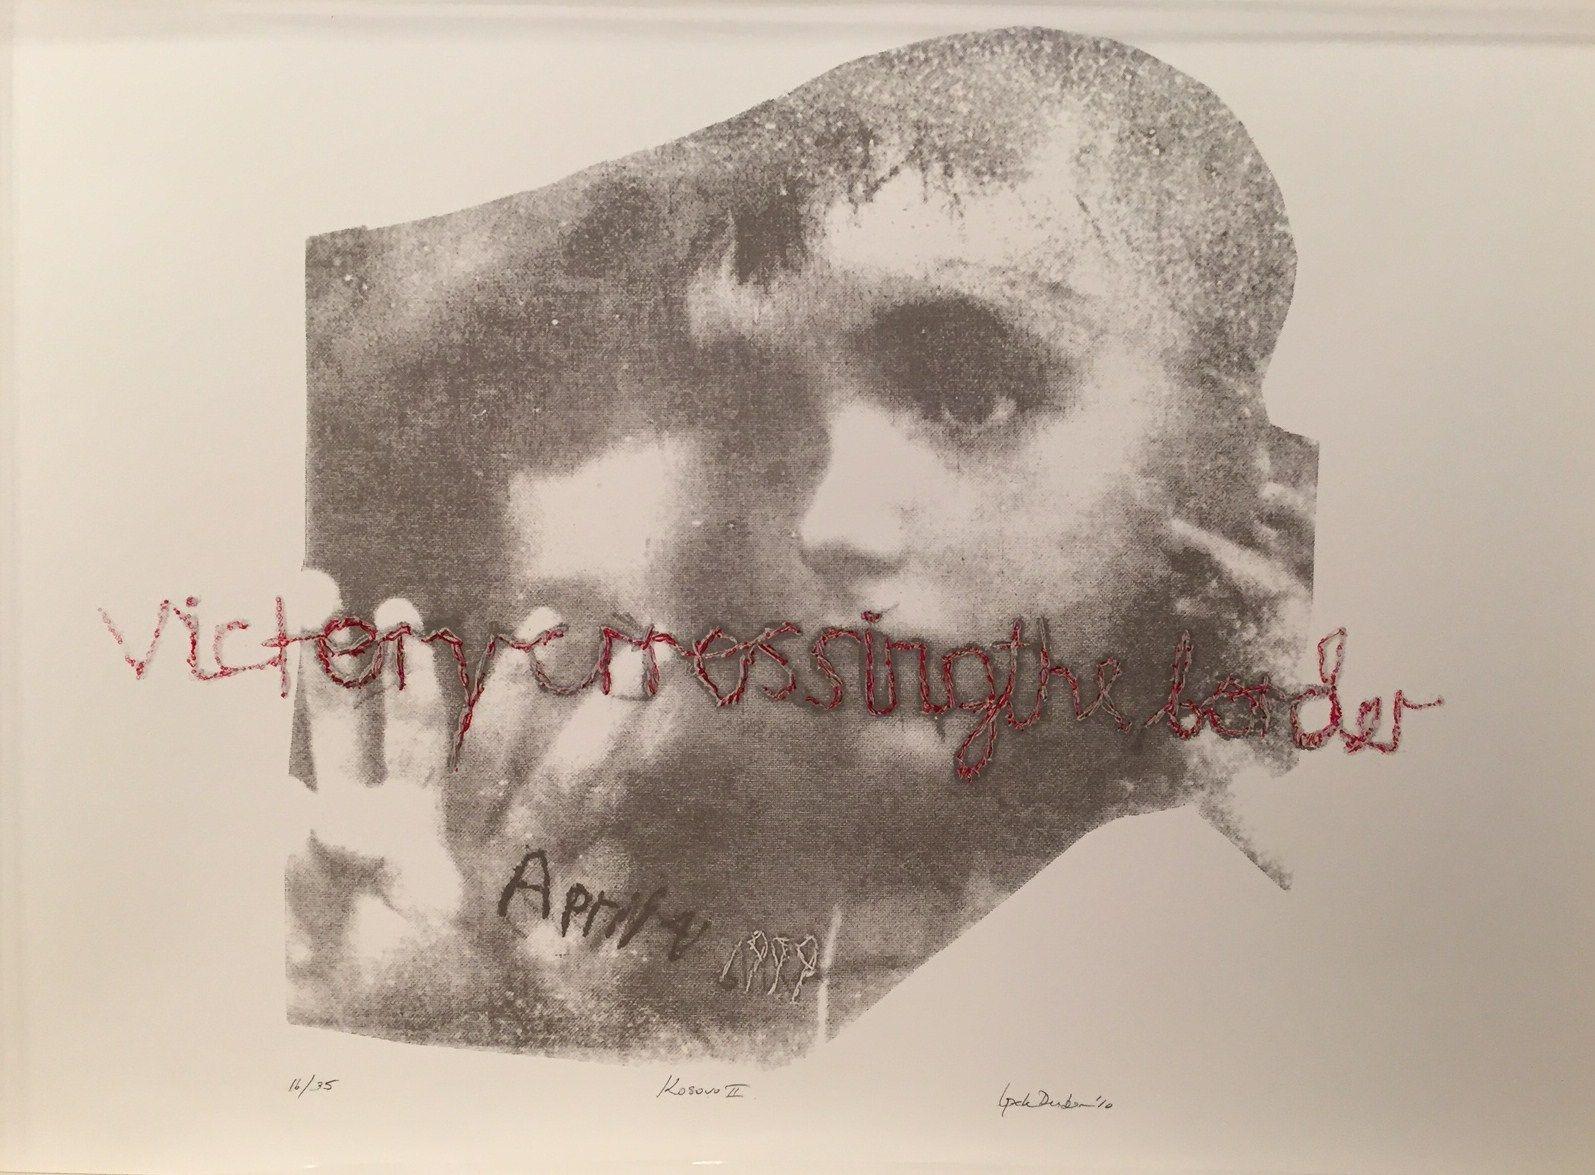 İpek Duben, Kosovar II, 2010, Screenprint 16/35, 70x50 cm.